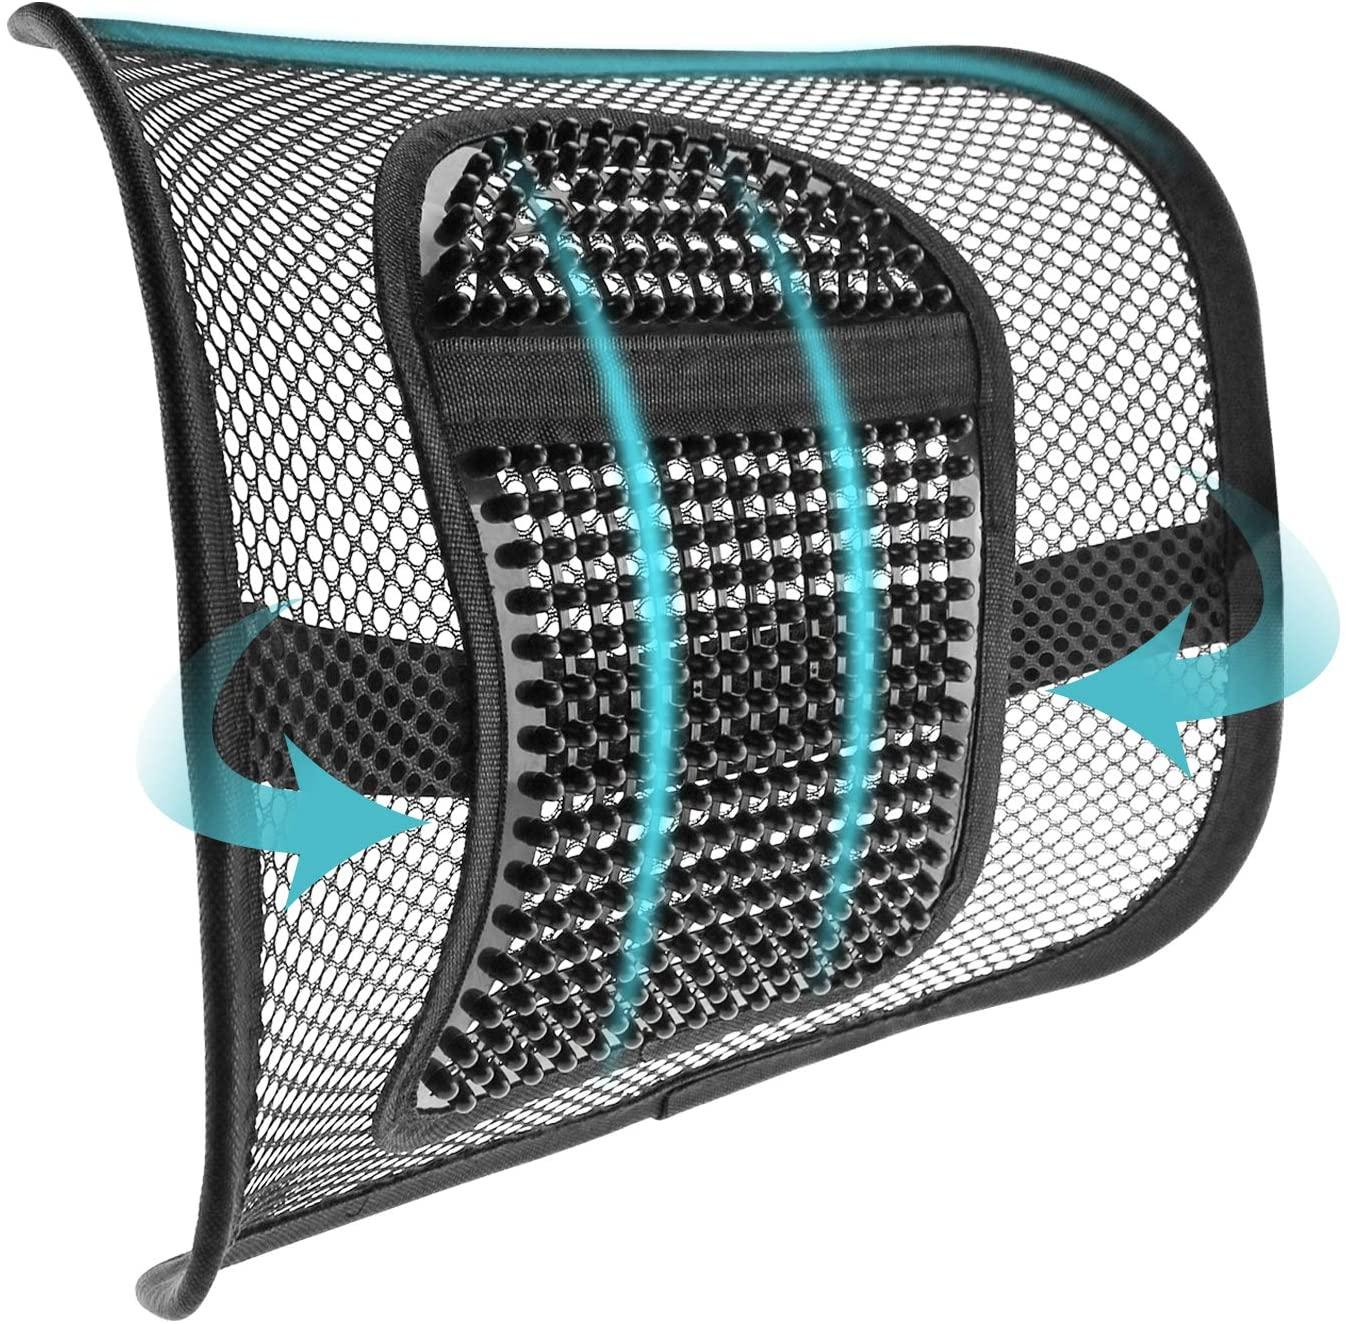 mesh lumbar support car lumbar cushion massage lumbar pillow lumbar support for office chair or car seat breathable and comfortable